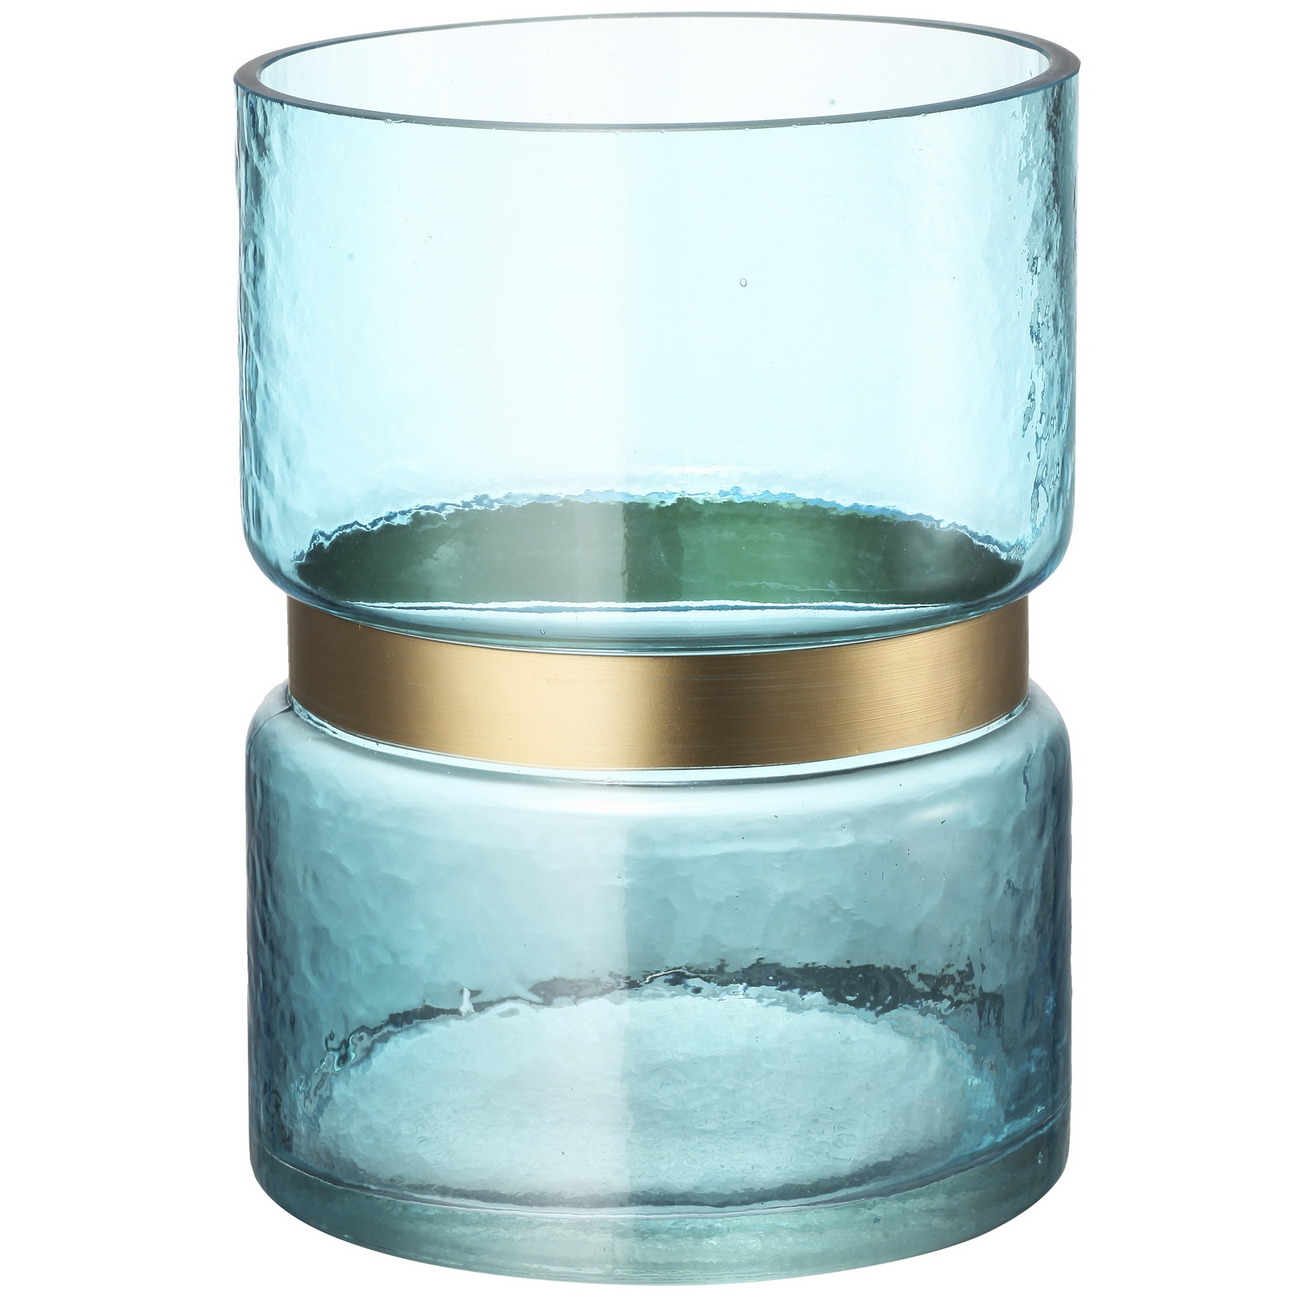 {} ARTEVALUCE Ваза Sefa Цвет: Голубой (15х20 см) artevaluce ваза arina цвет голубой 15х24 см